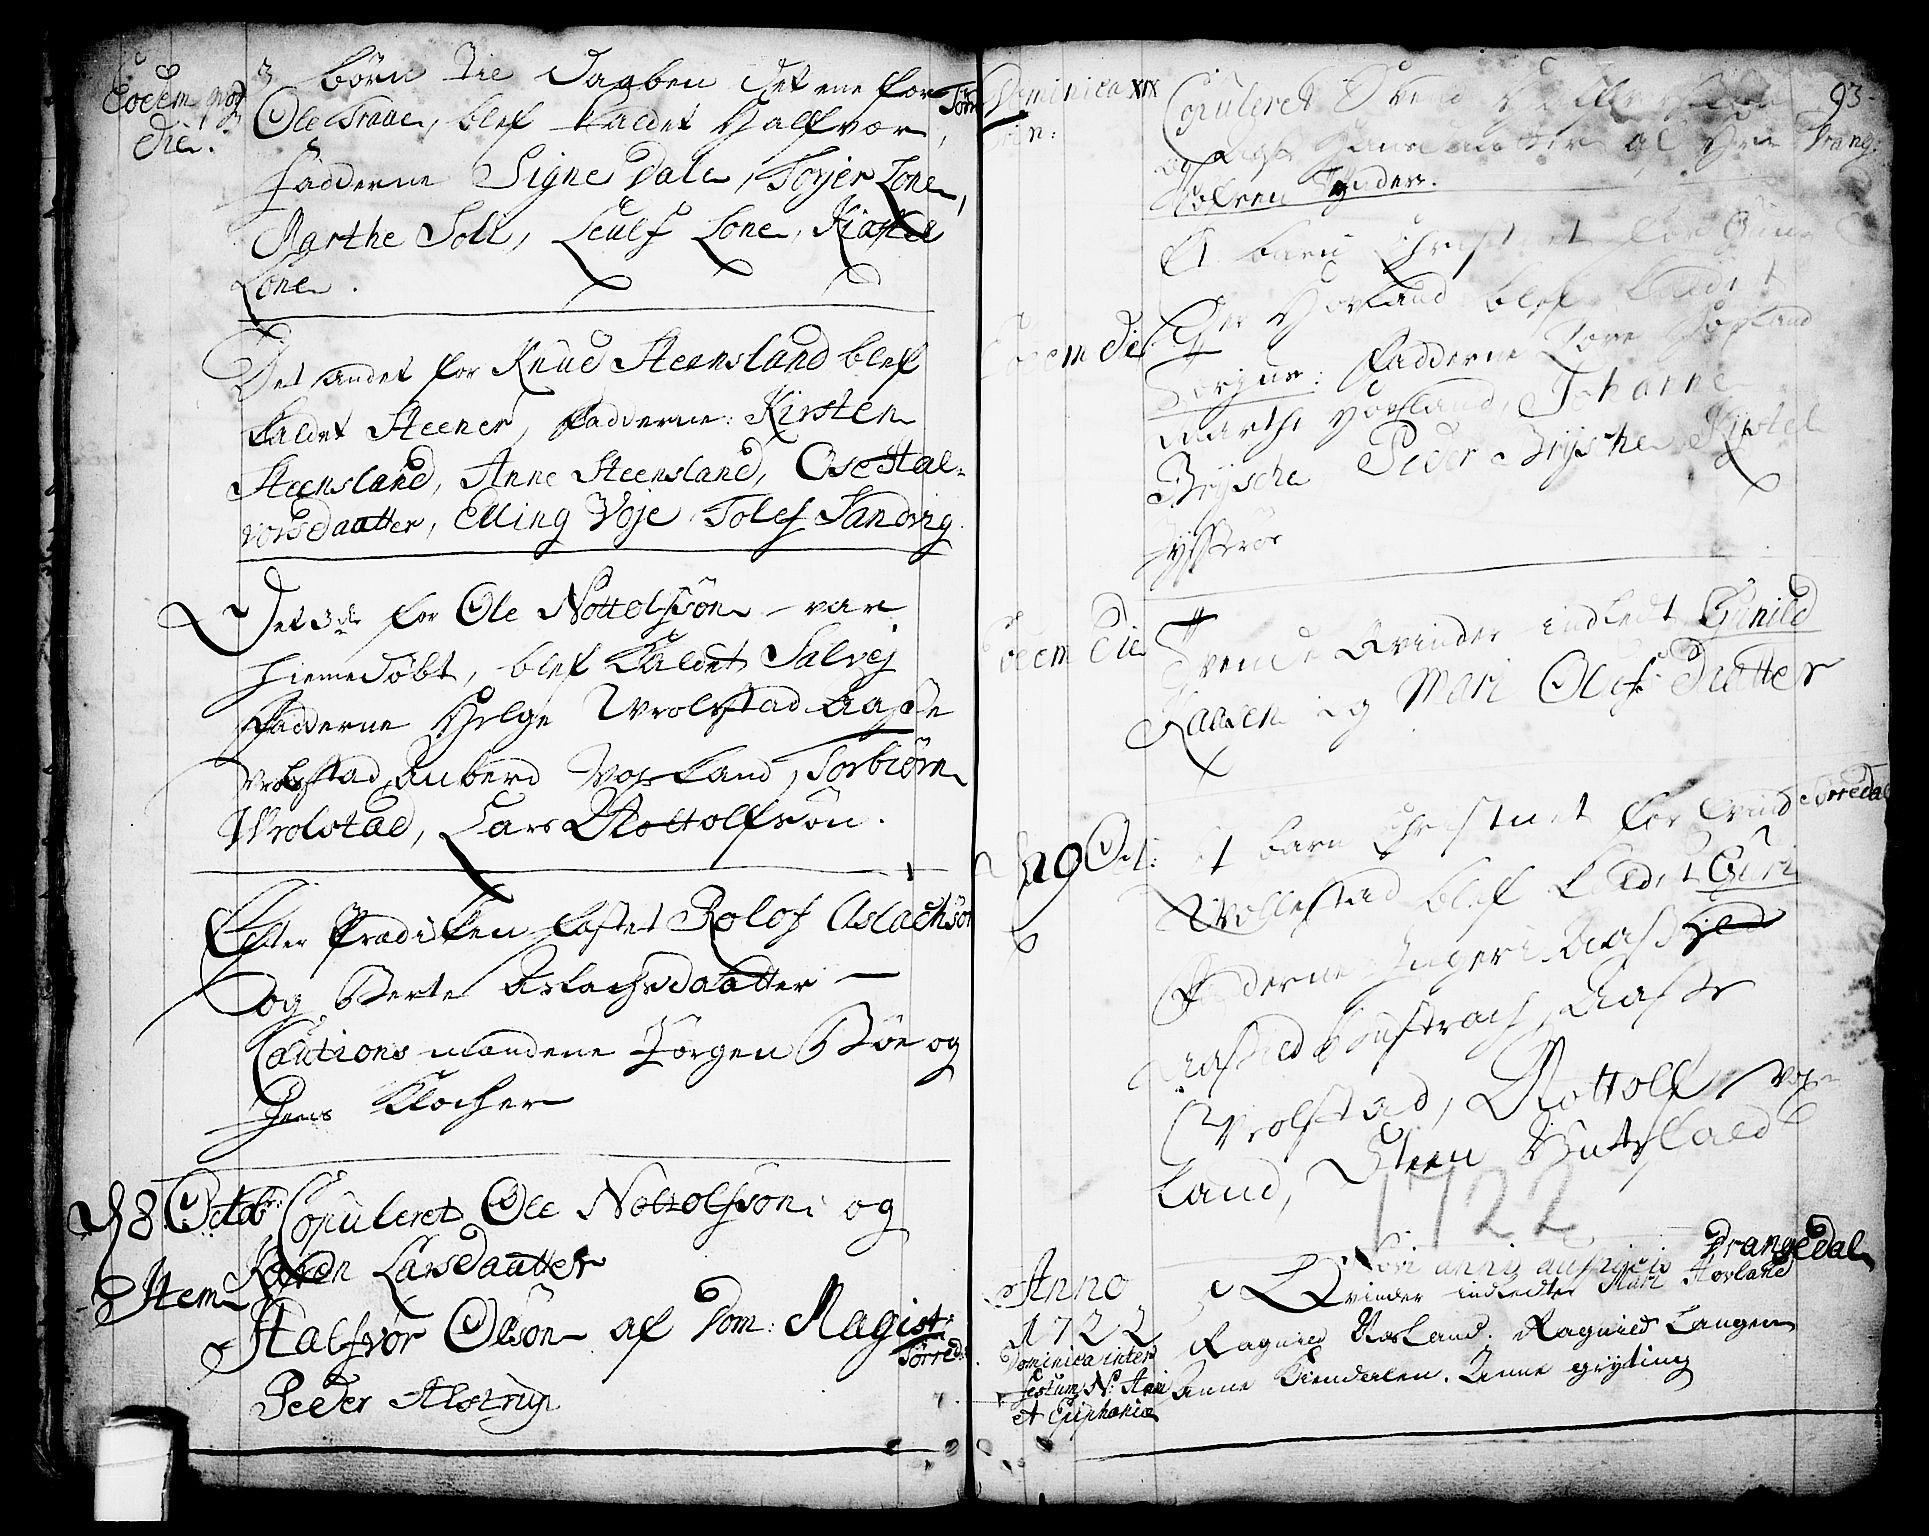 SAKO, Drangedal kirkebøker, F/Fa/L0001: Ministerialbok nr. 1, 1697-1767, s. 93